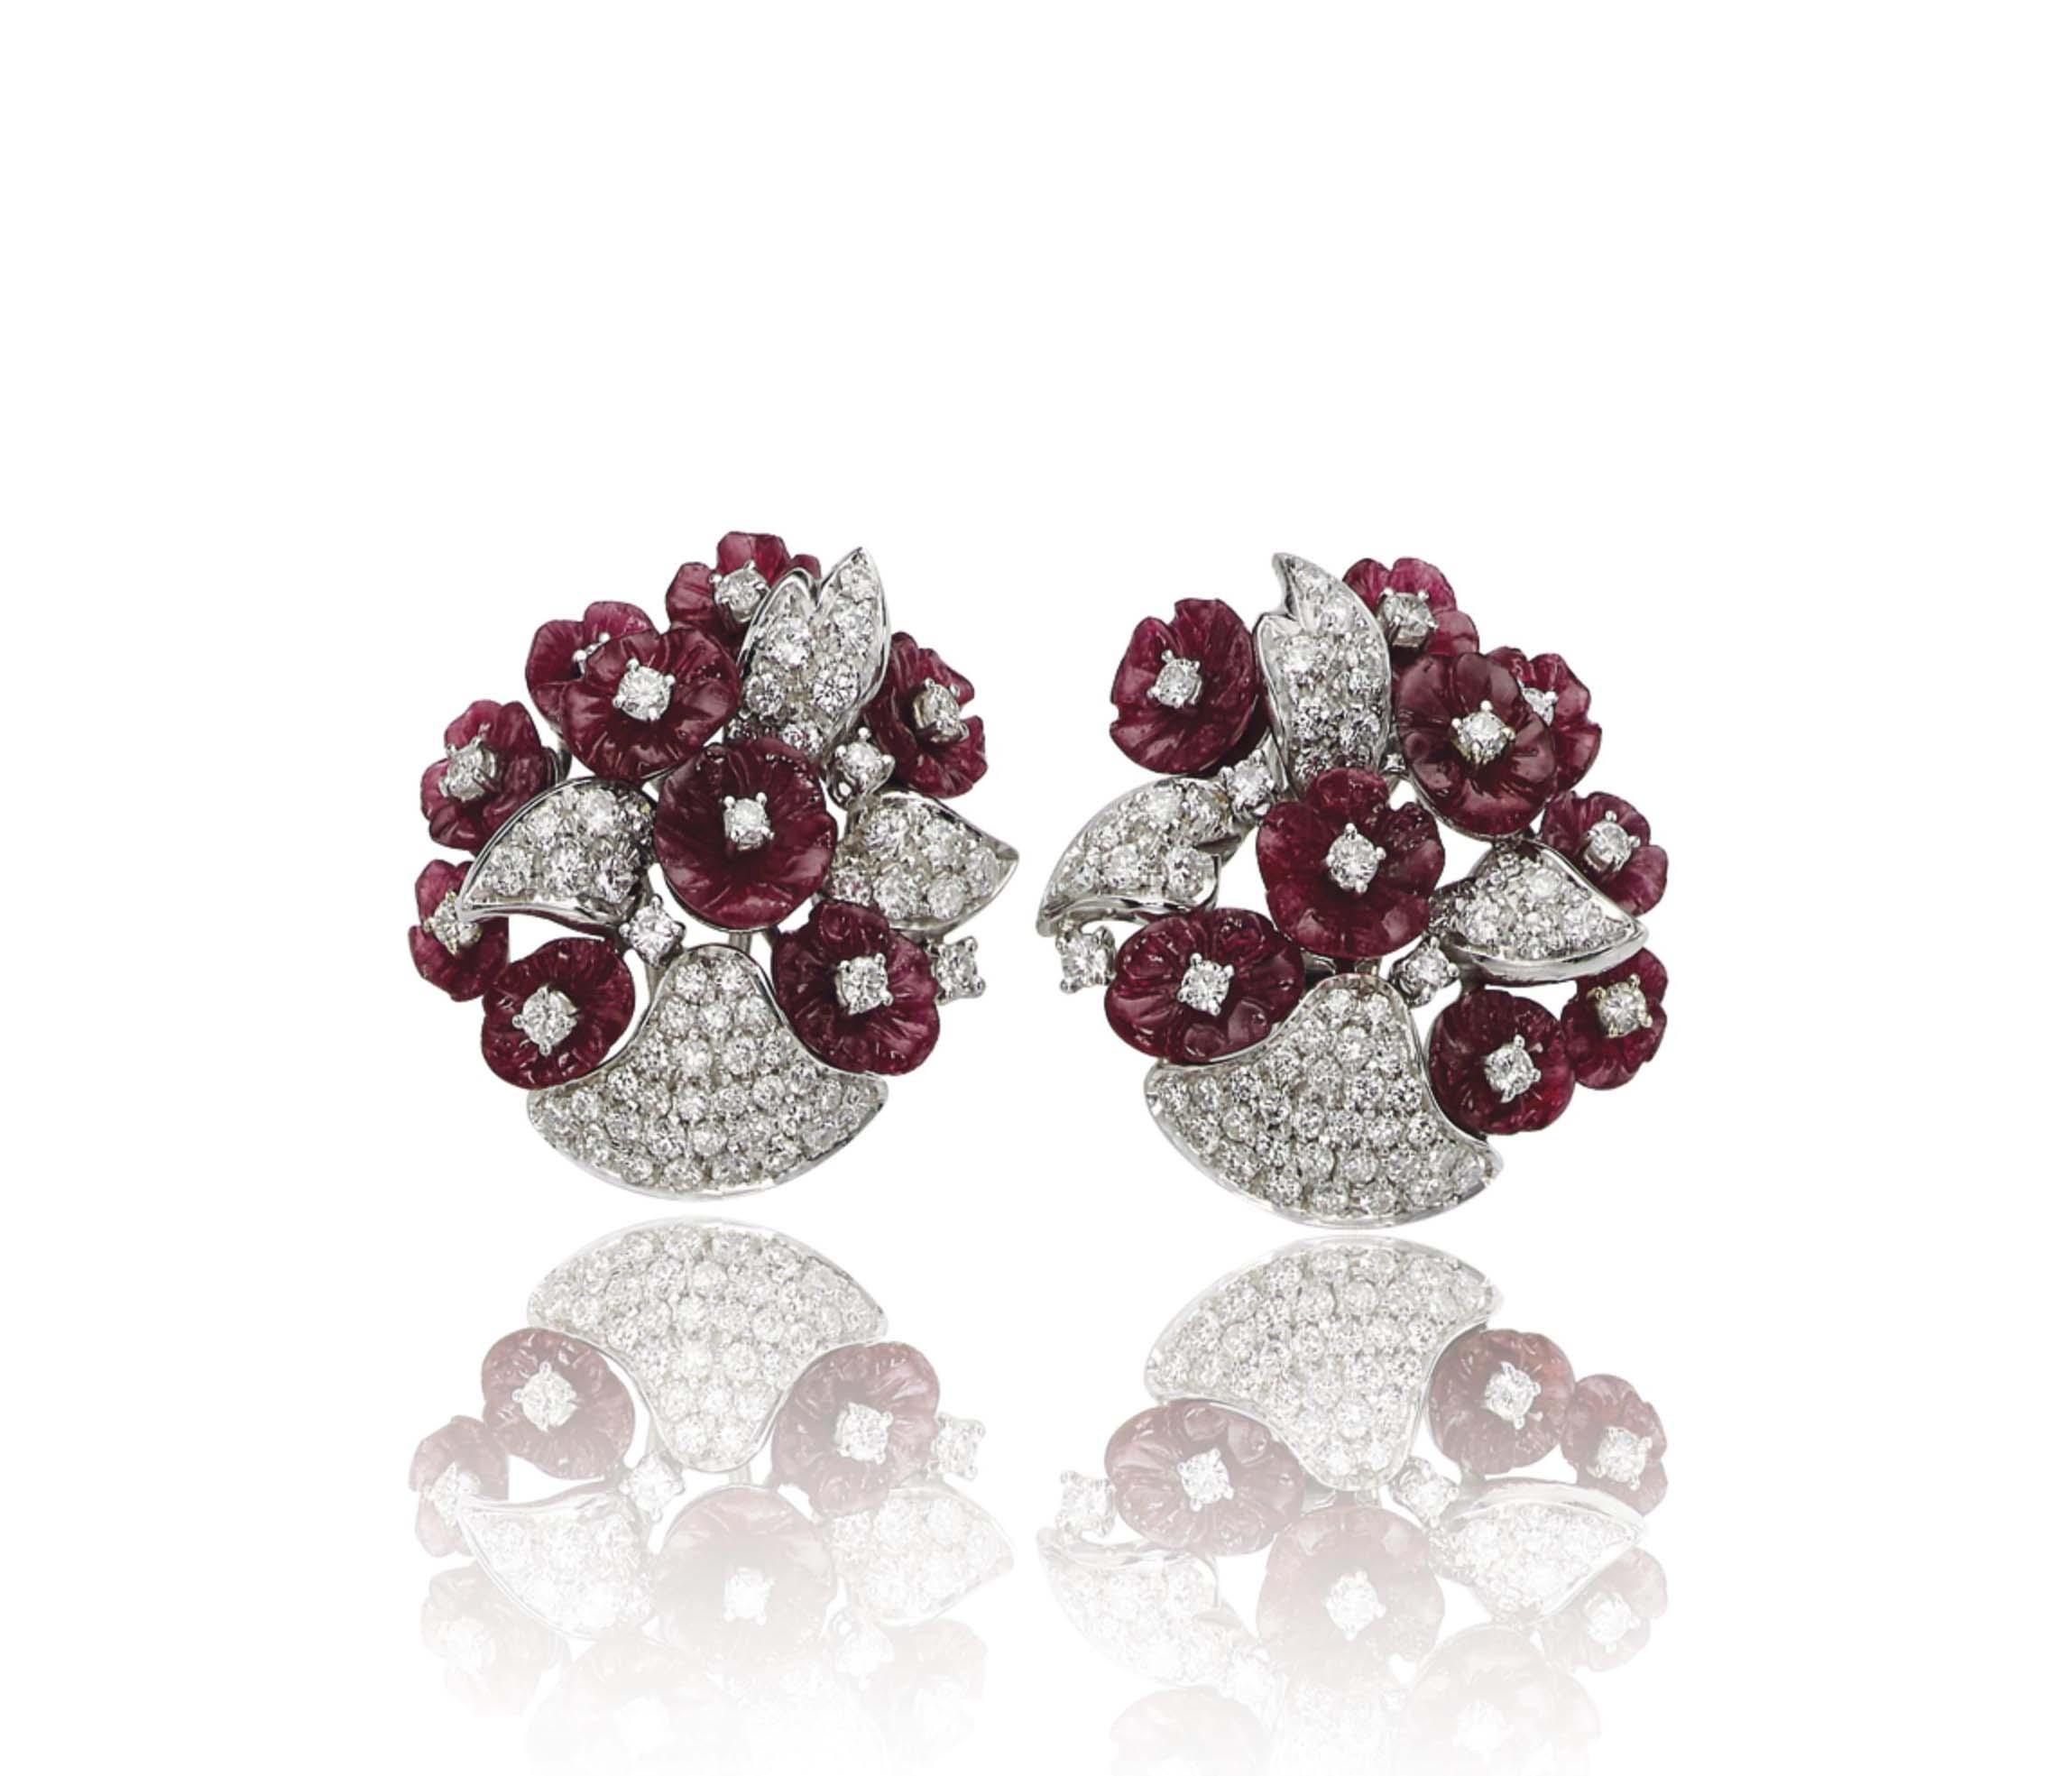 A PAIR OF RUBY AND DIAMOND EAR CLIPS, BY GIULIO VERONESI